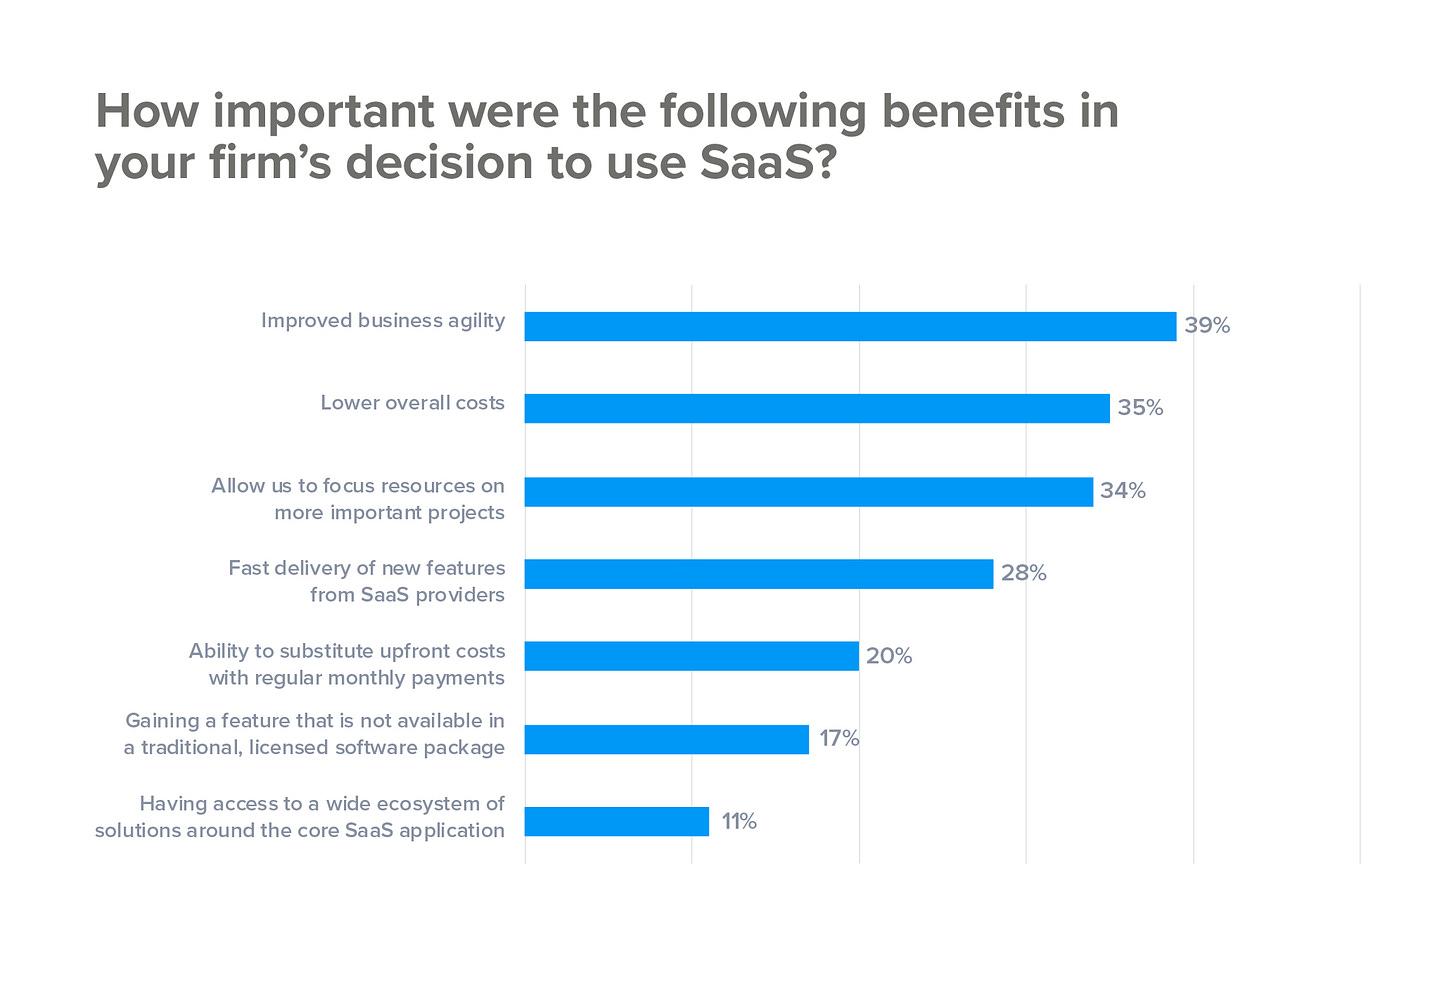 The main benefits of SaaS